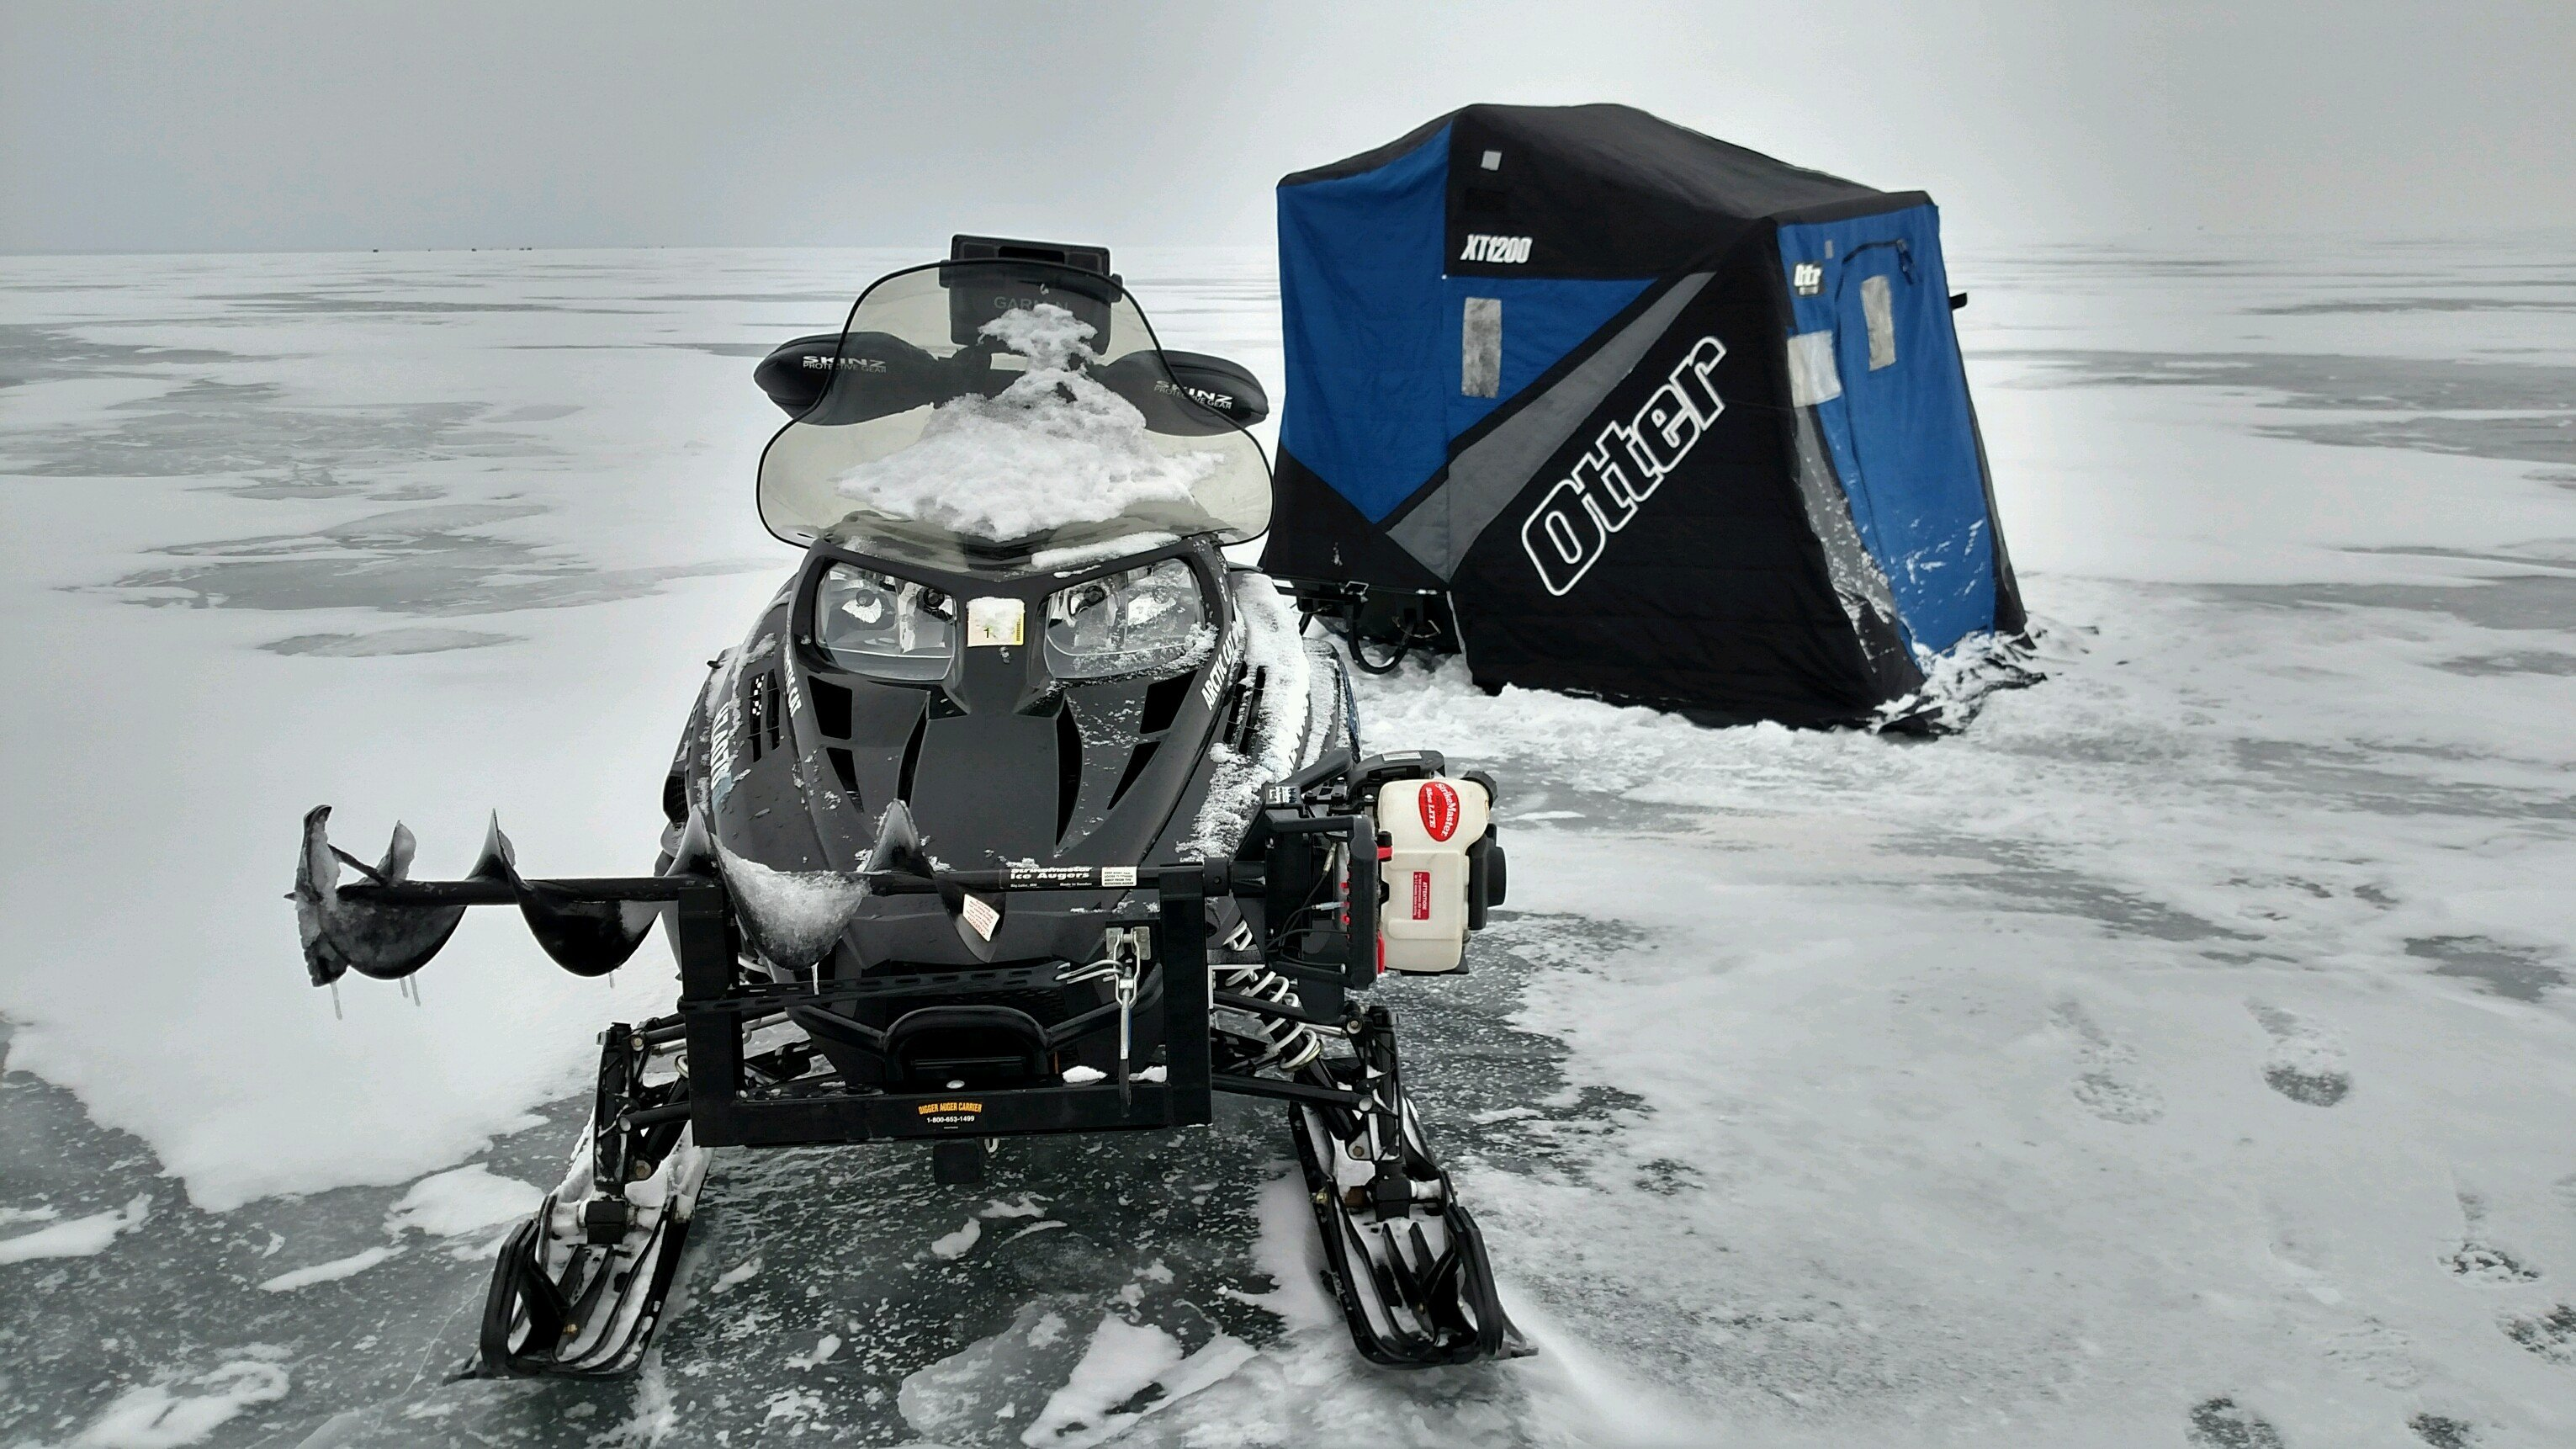 Ice fishing mods-1714803521.jpeg